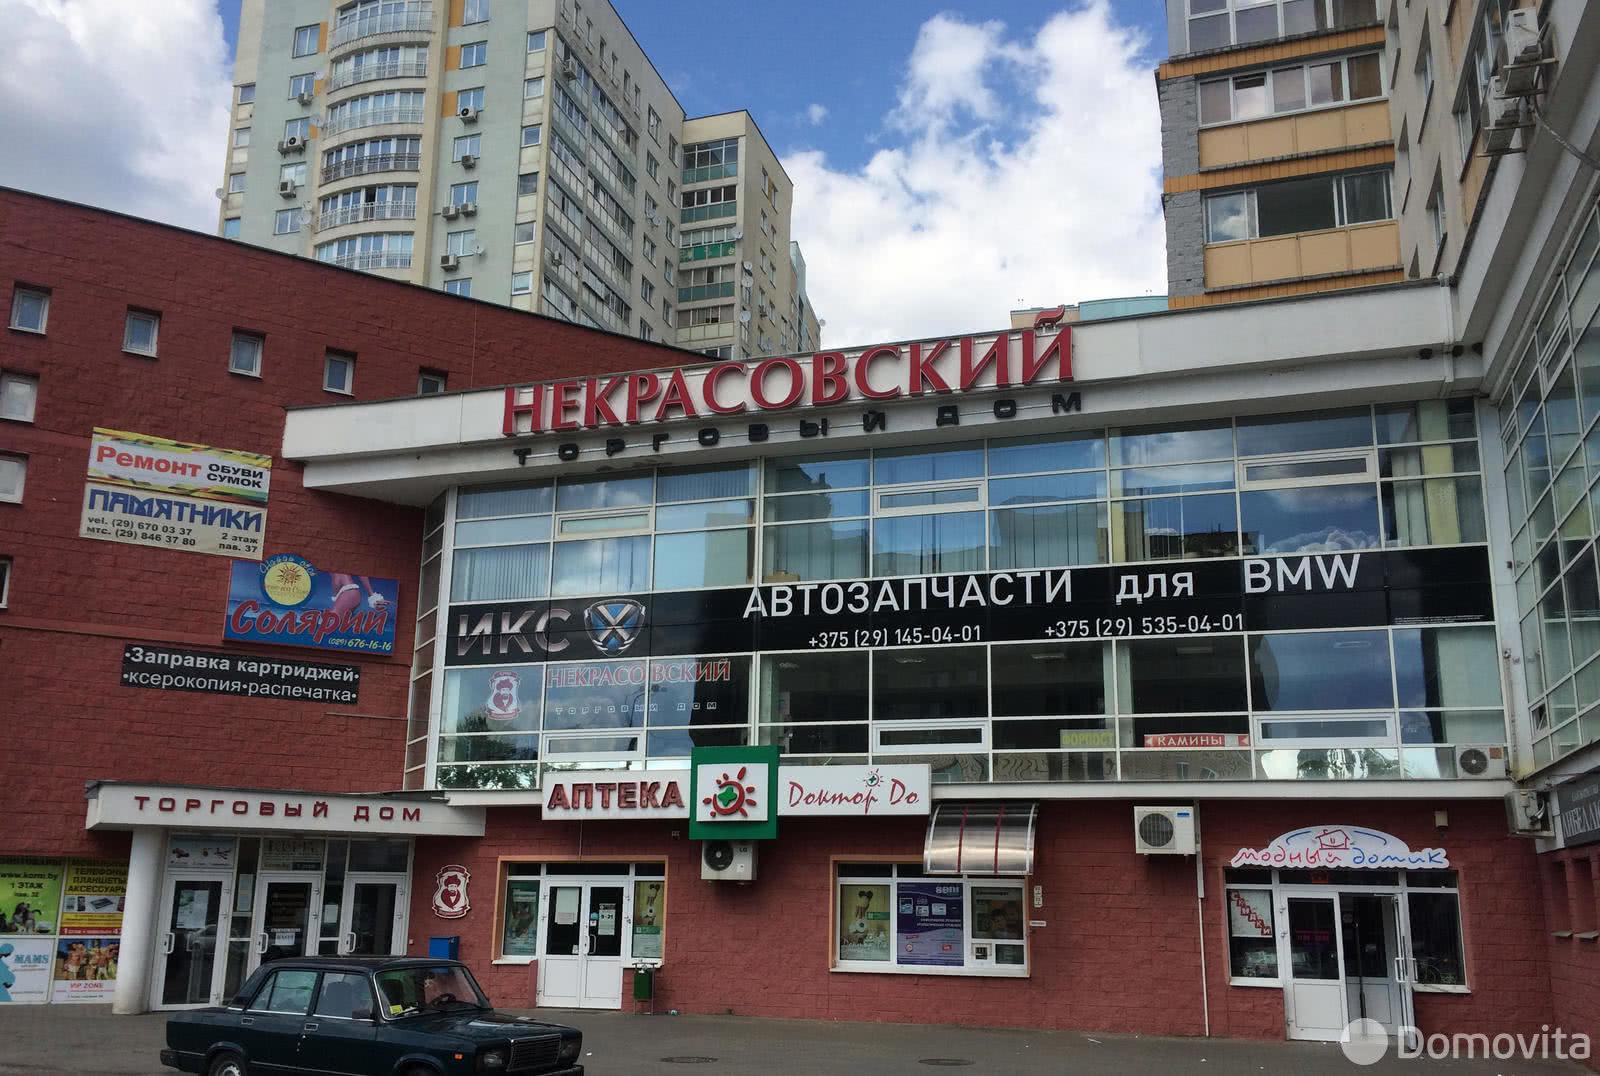 ТЦ Некрасовский - фото 1